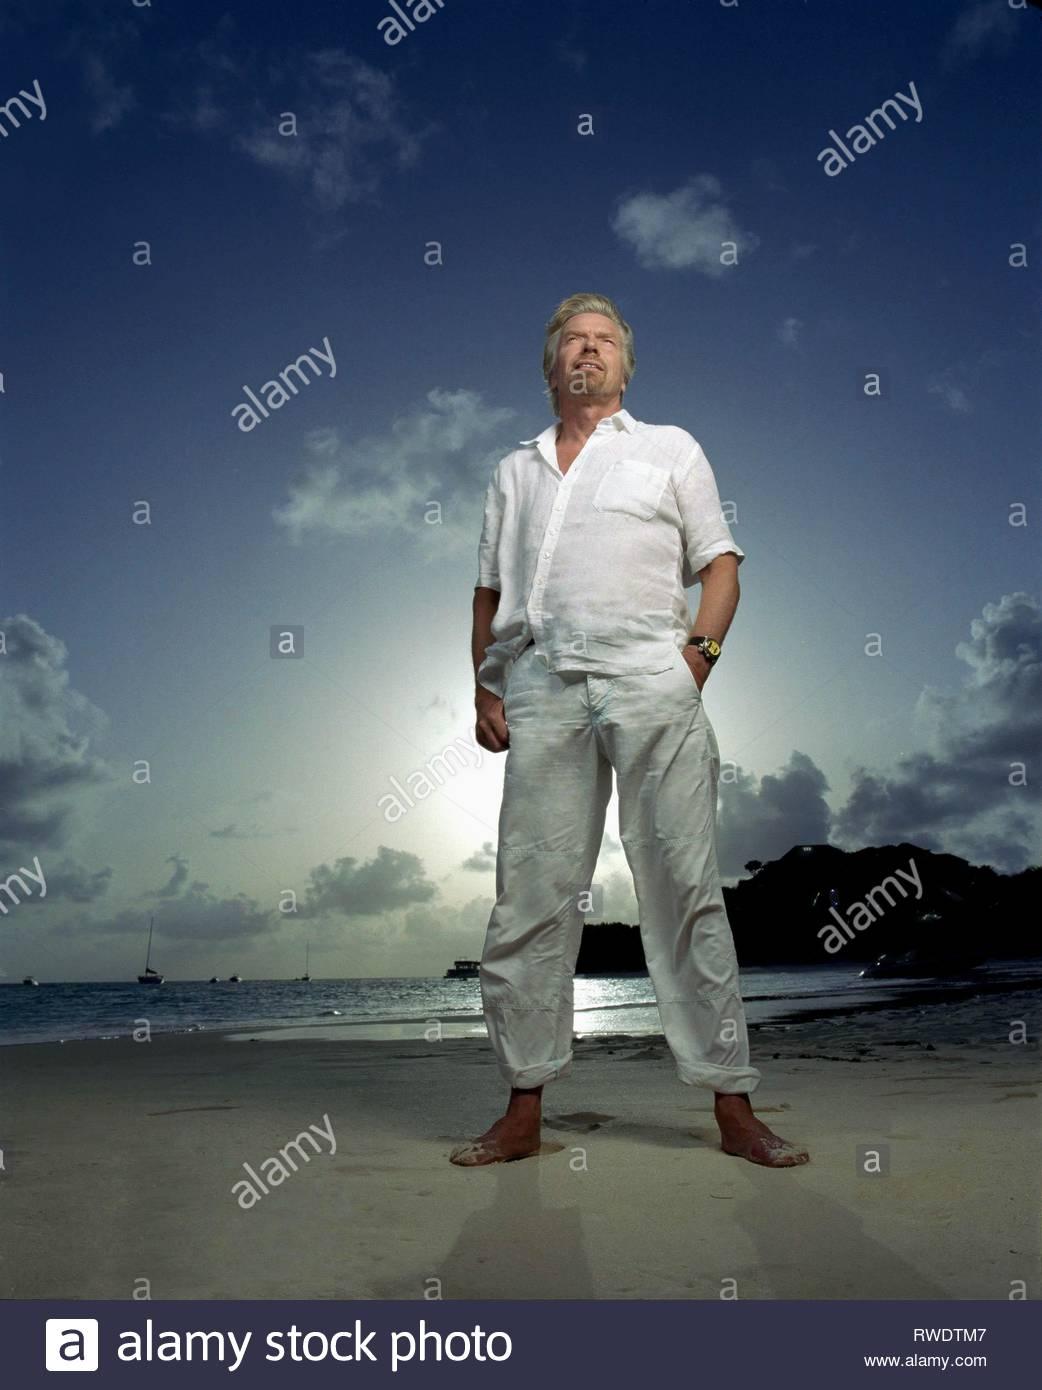 RICHARD BRANSON, THE REBEL BILLIONAIRE: BRANSON'S QUEST FOR THE BEST  , 2004 - Stock Image